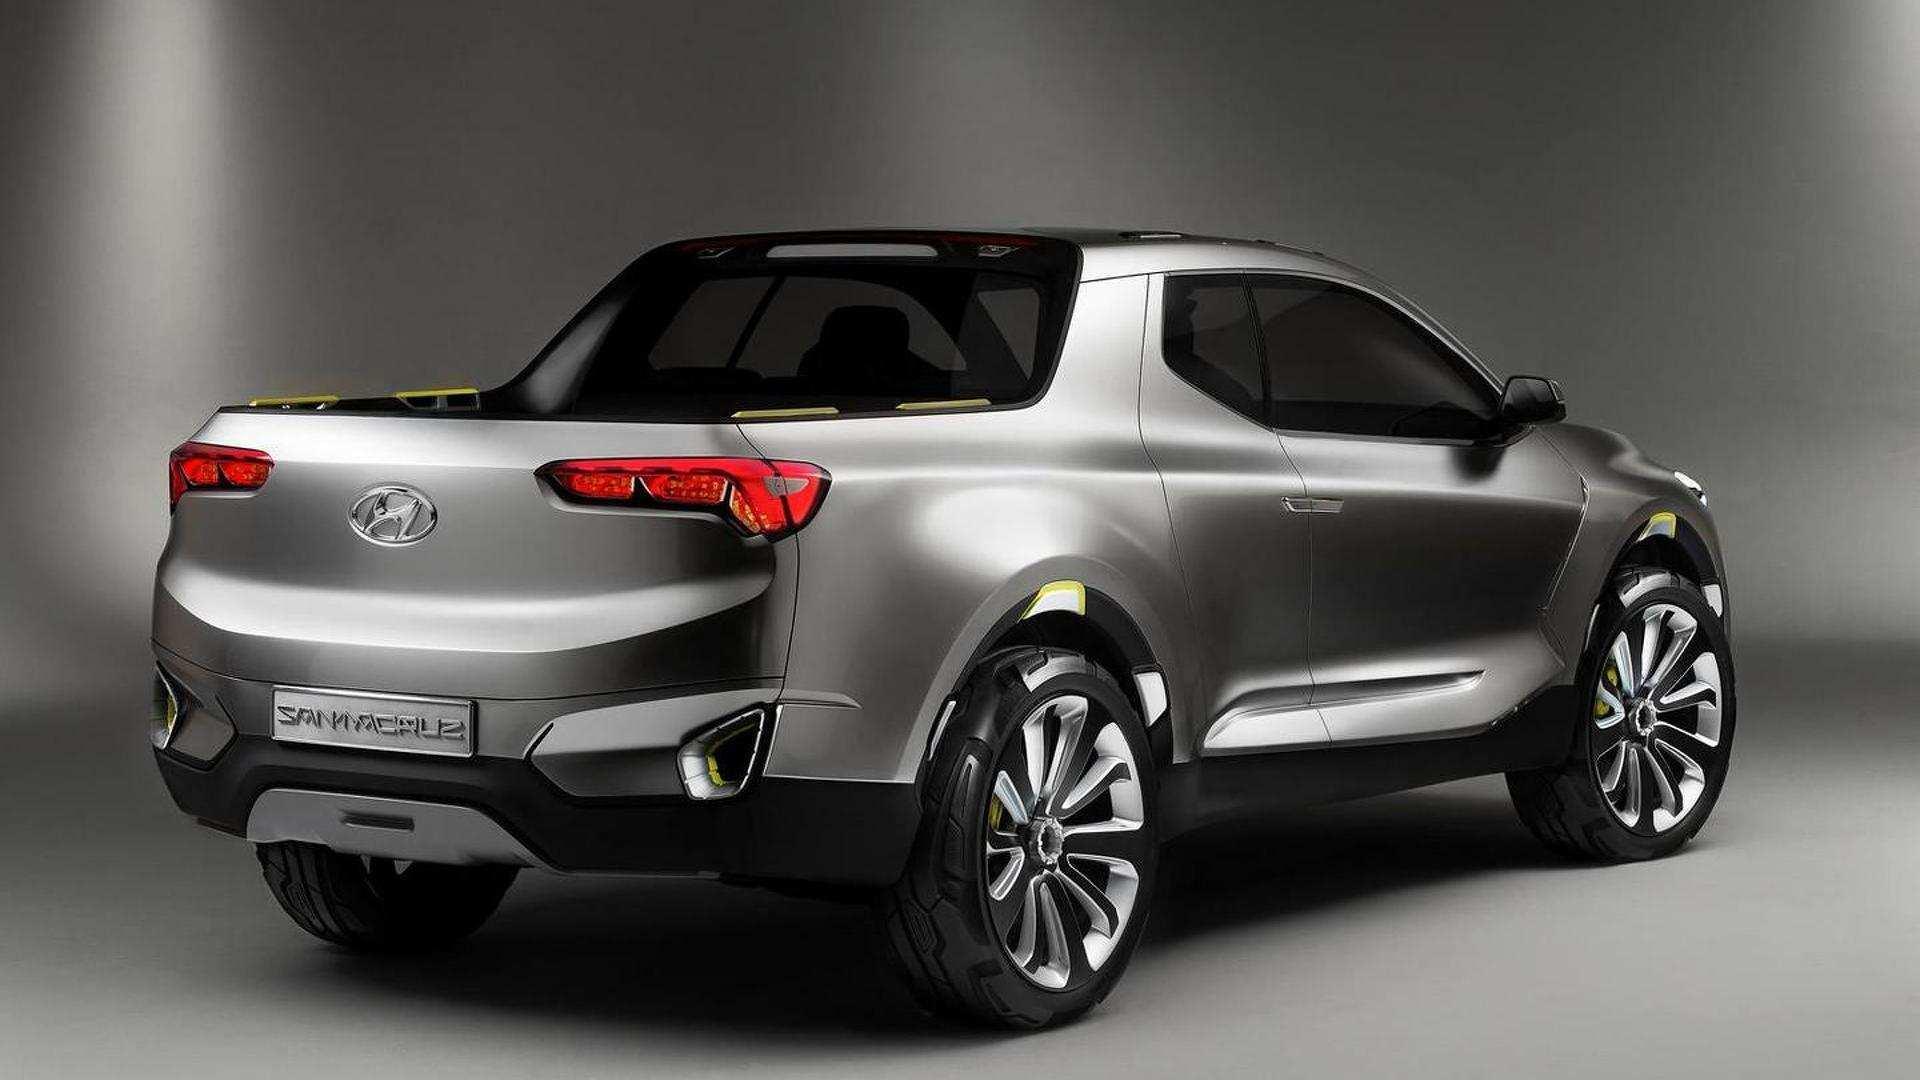 90 Concept of Hyundai Santa Cruz 2020 Price with Hyundai Santa Cruz 2020